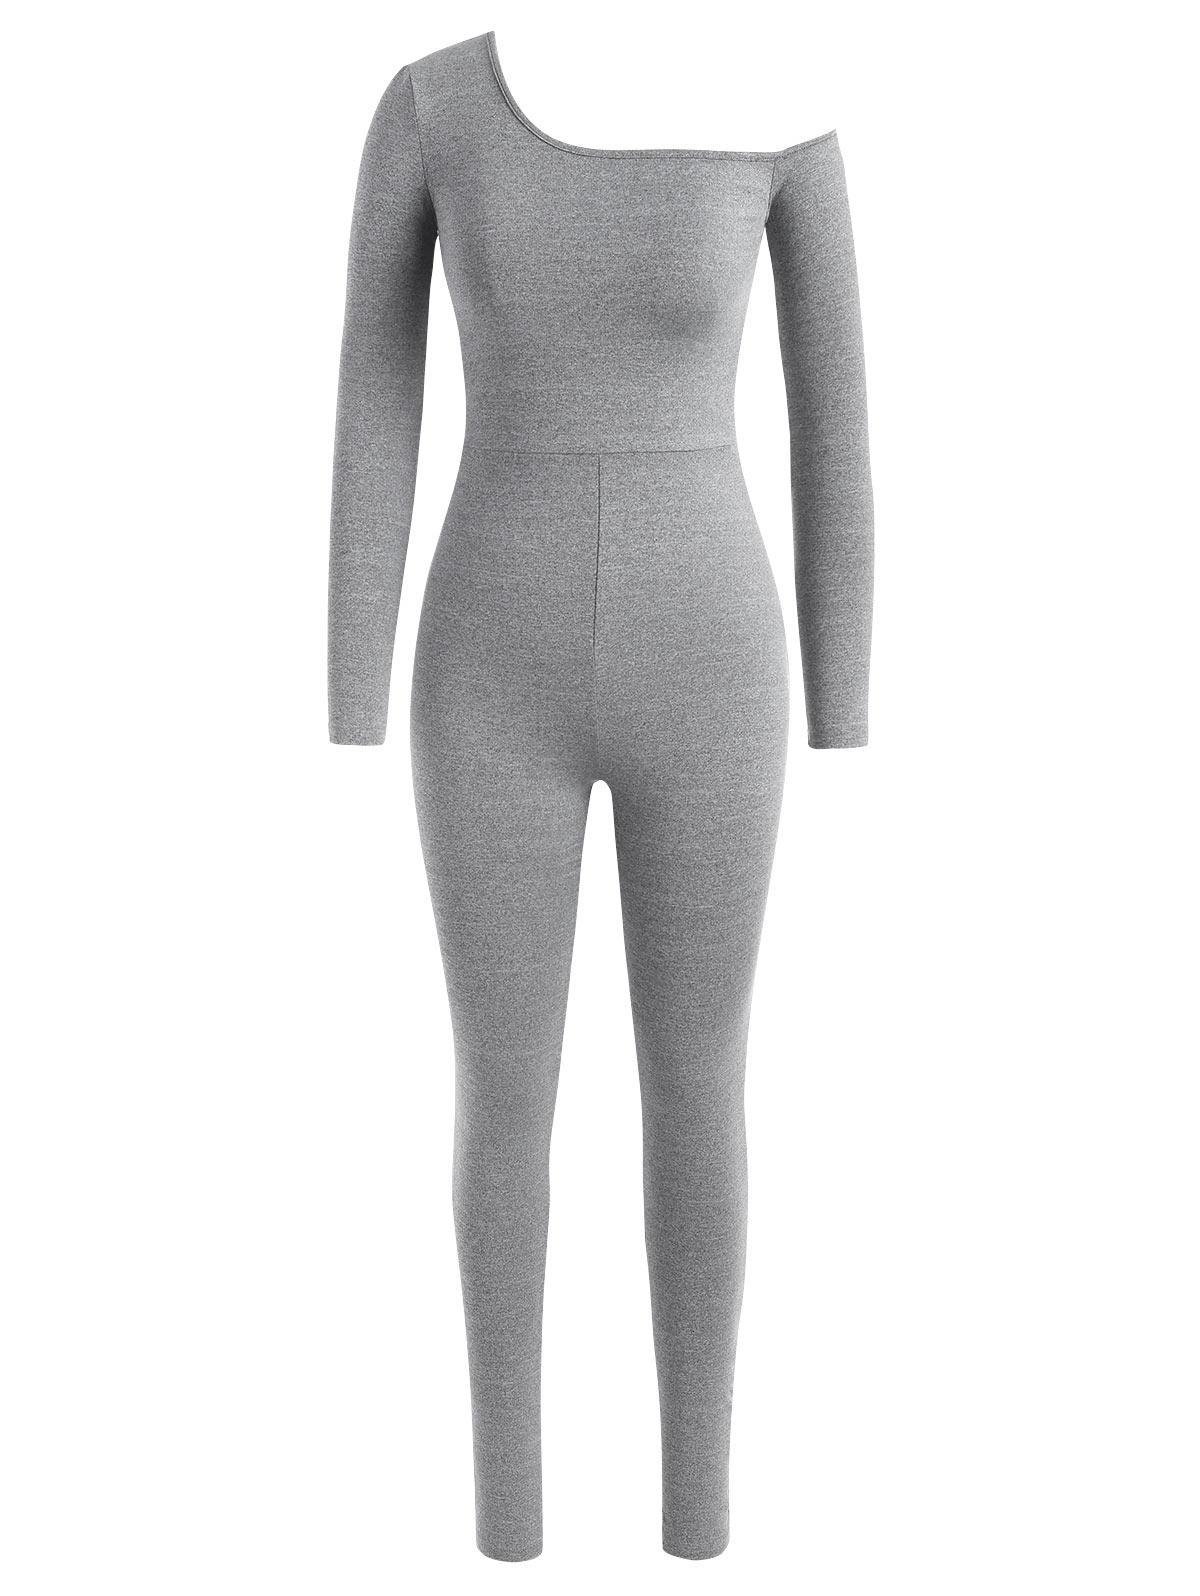 Marled Skew Neck Unitard Jumpsuit